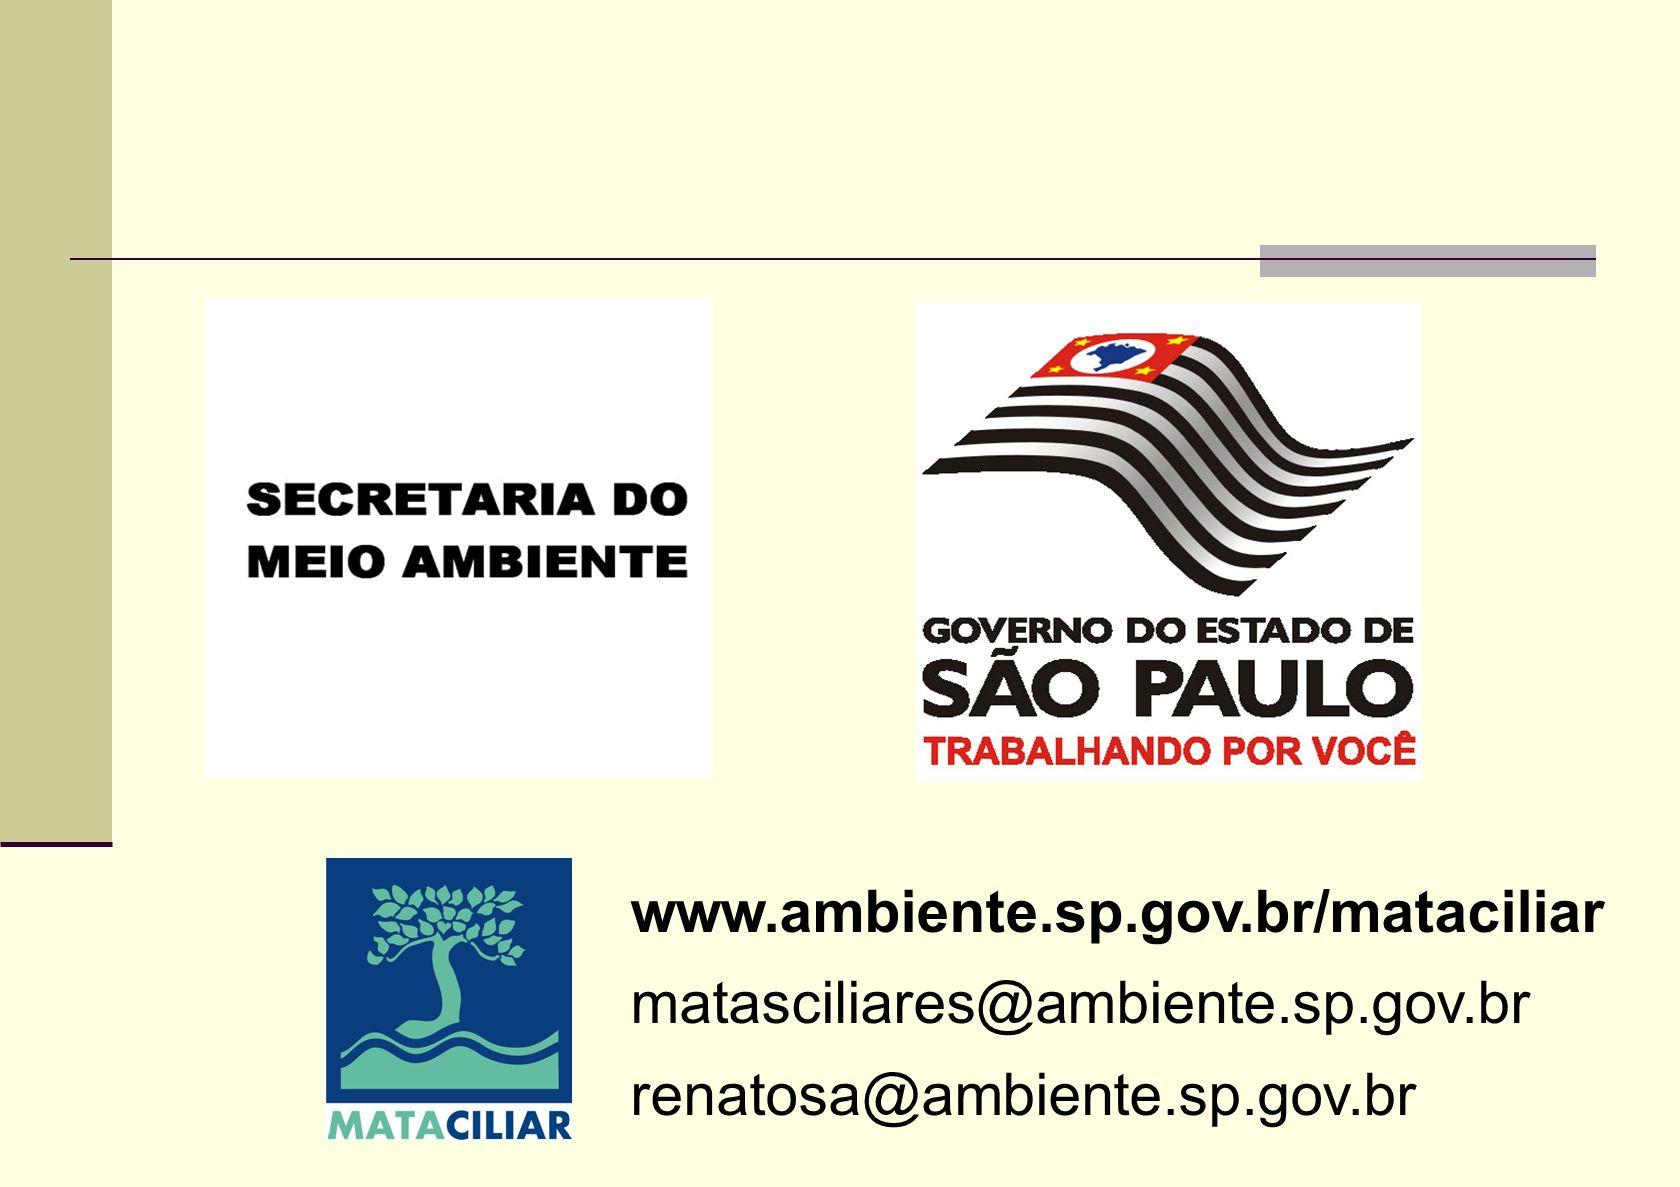 www.ambiente.sp.gov.br/mataciliar matasciliares@ambiente.sp.gov.br renatosa@ambiente.sp.gov.br